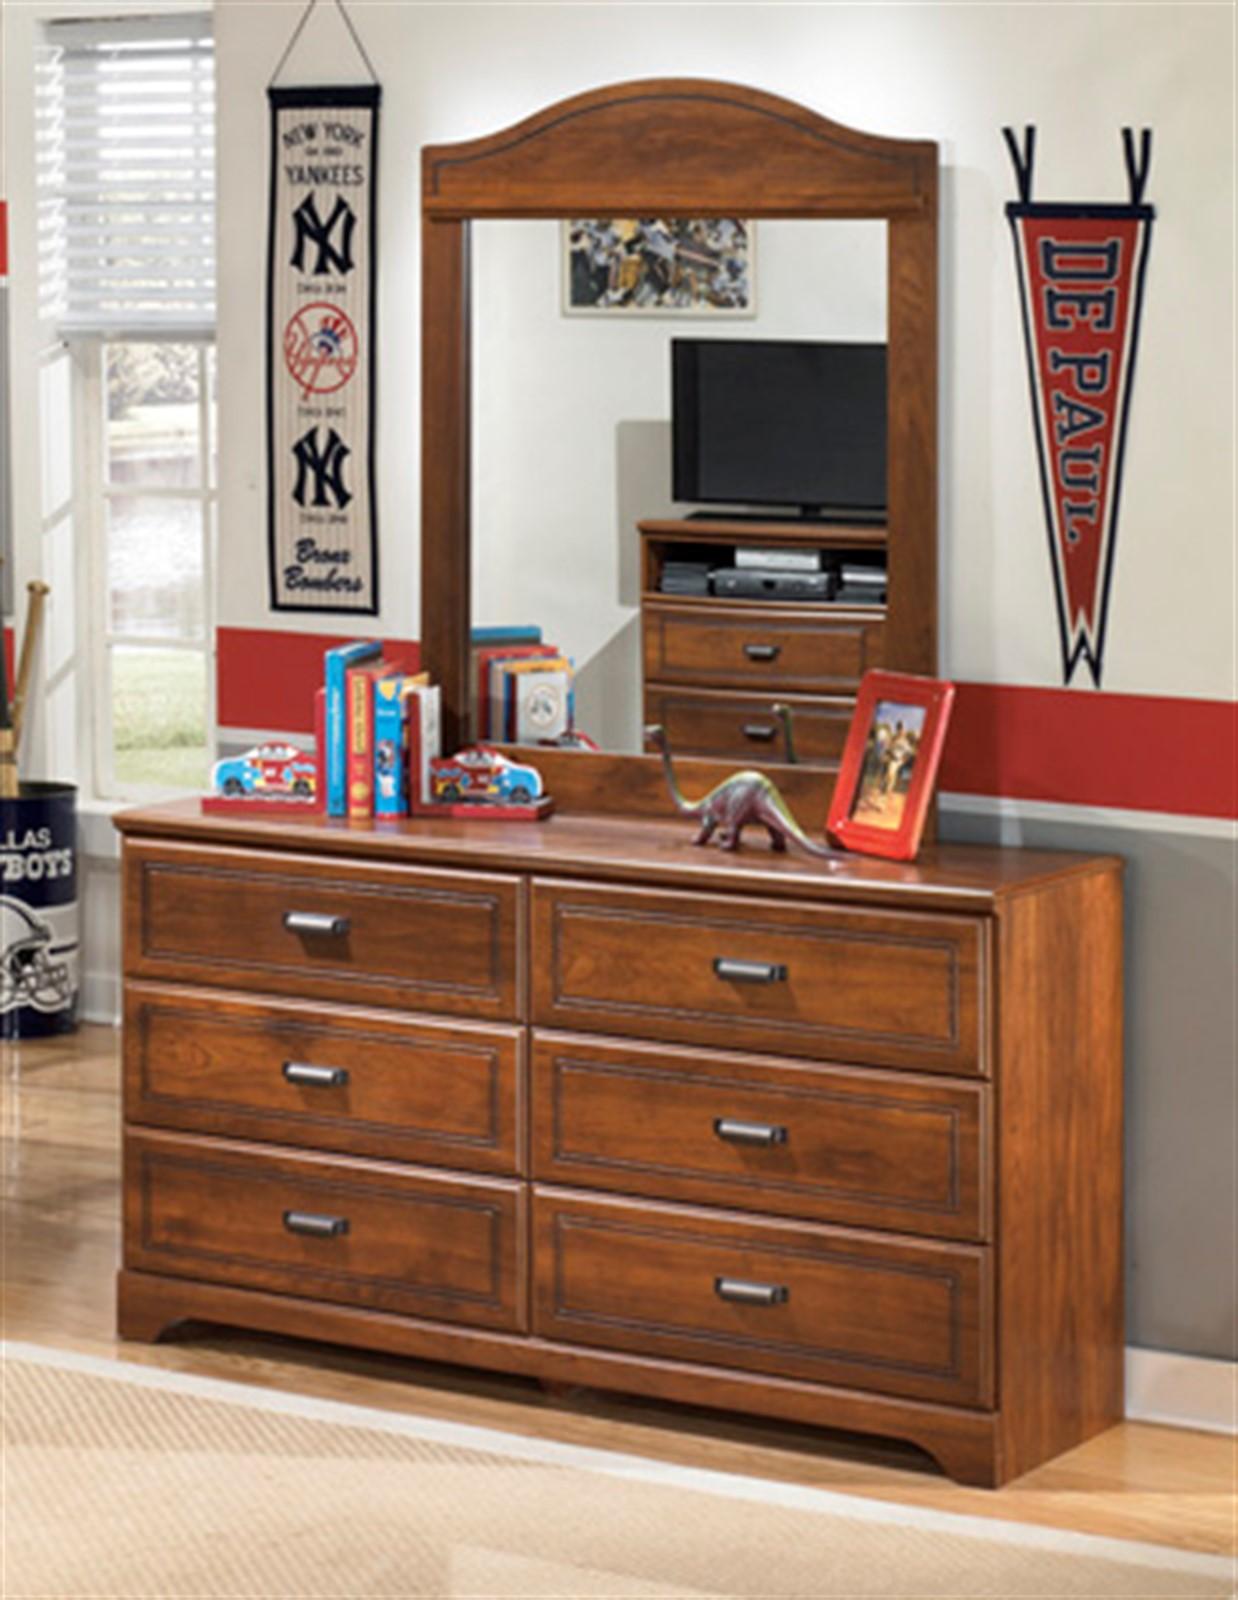 Barchan Dresser and Mirror Set - Medium Brown